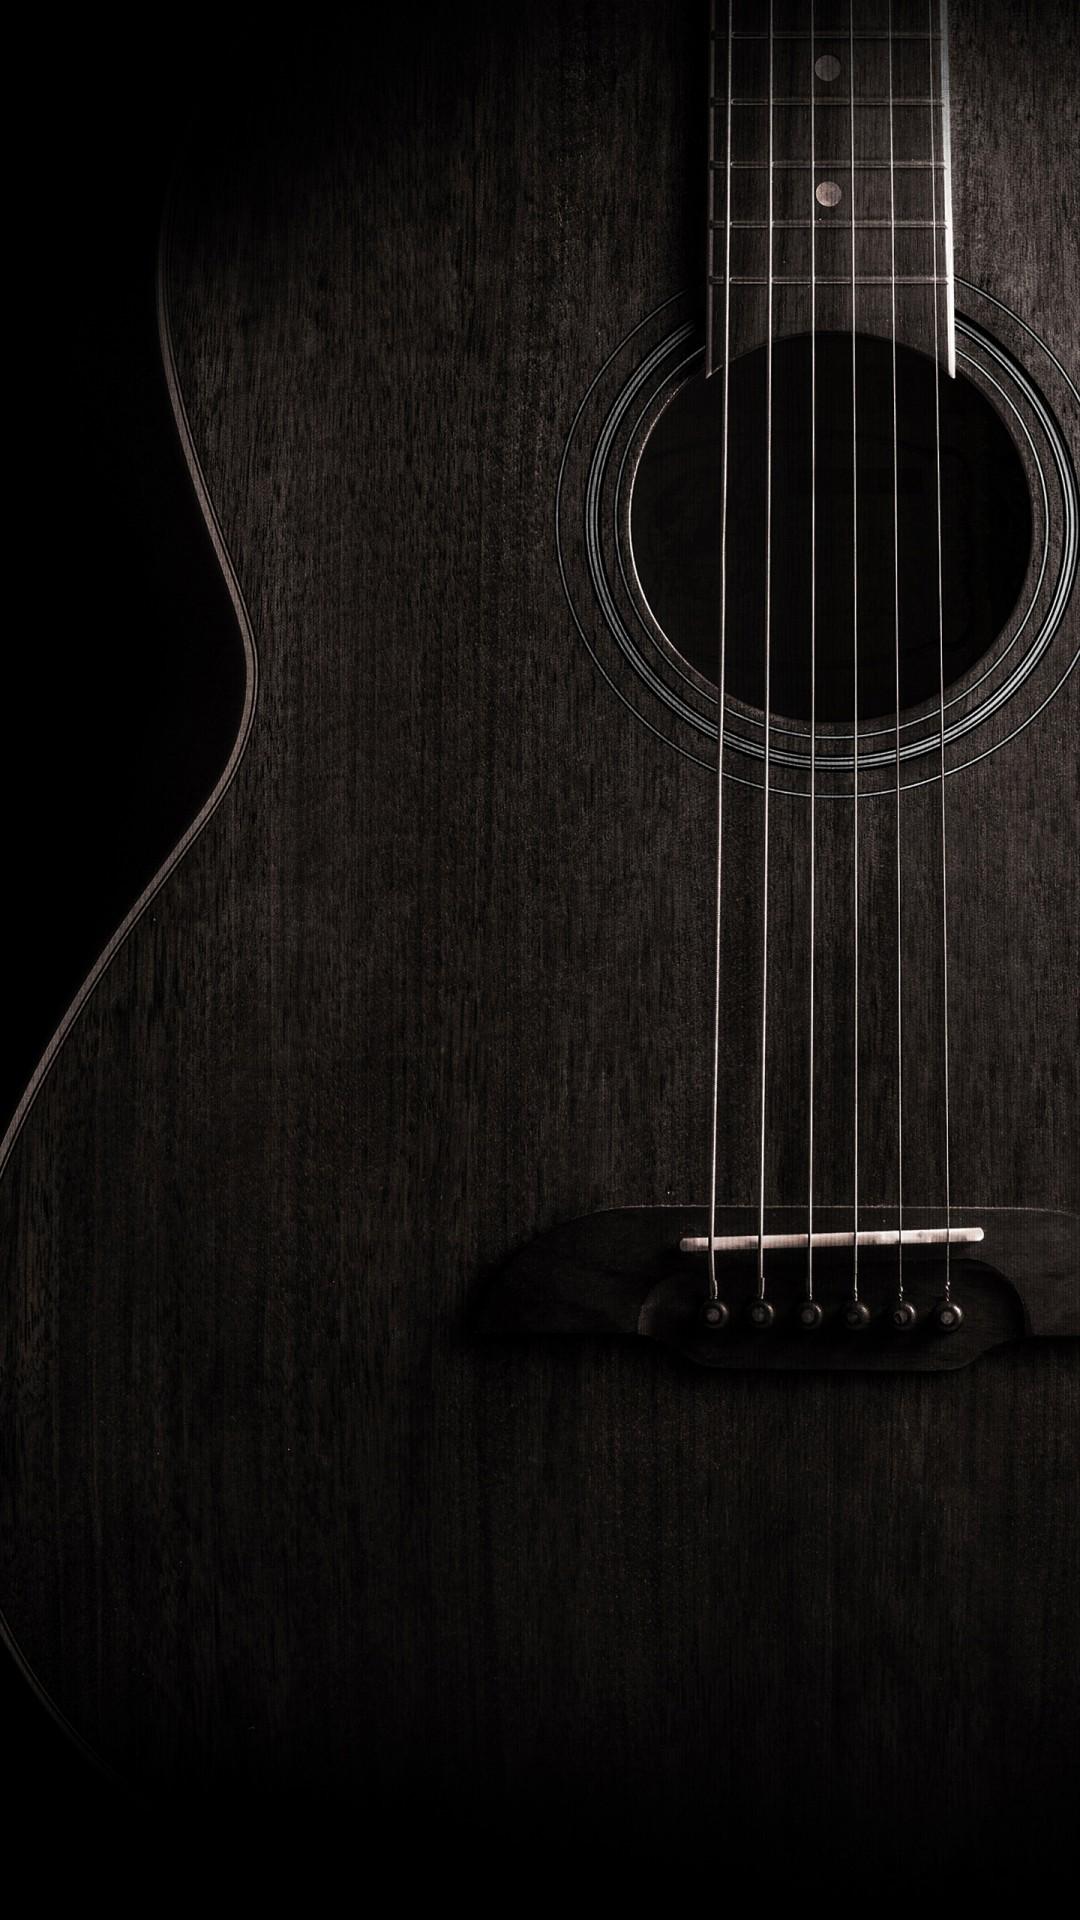 Free Guitar Huawei Mate 10 phone wallpaper by kaylachs